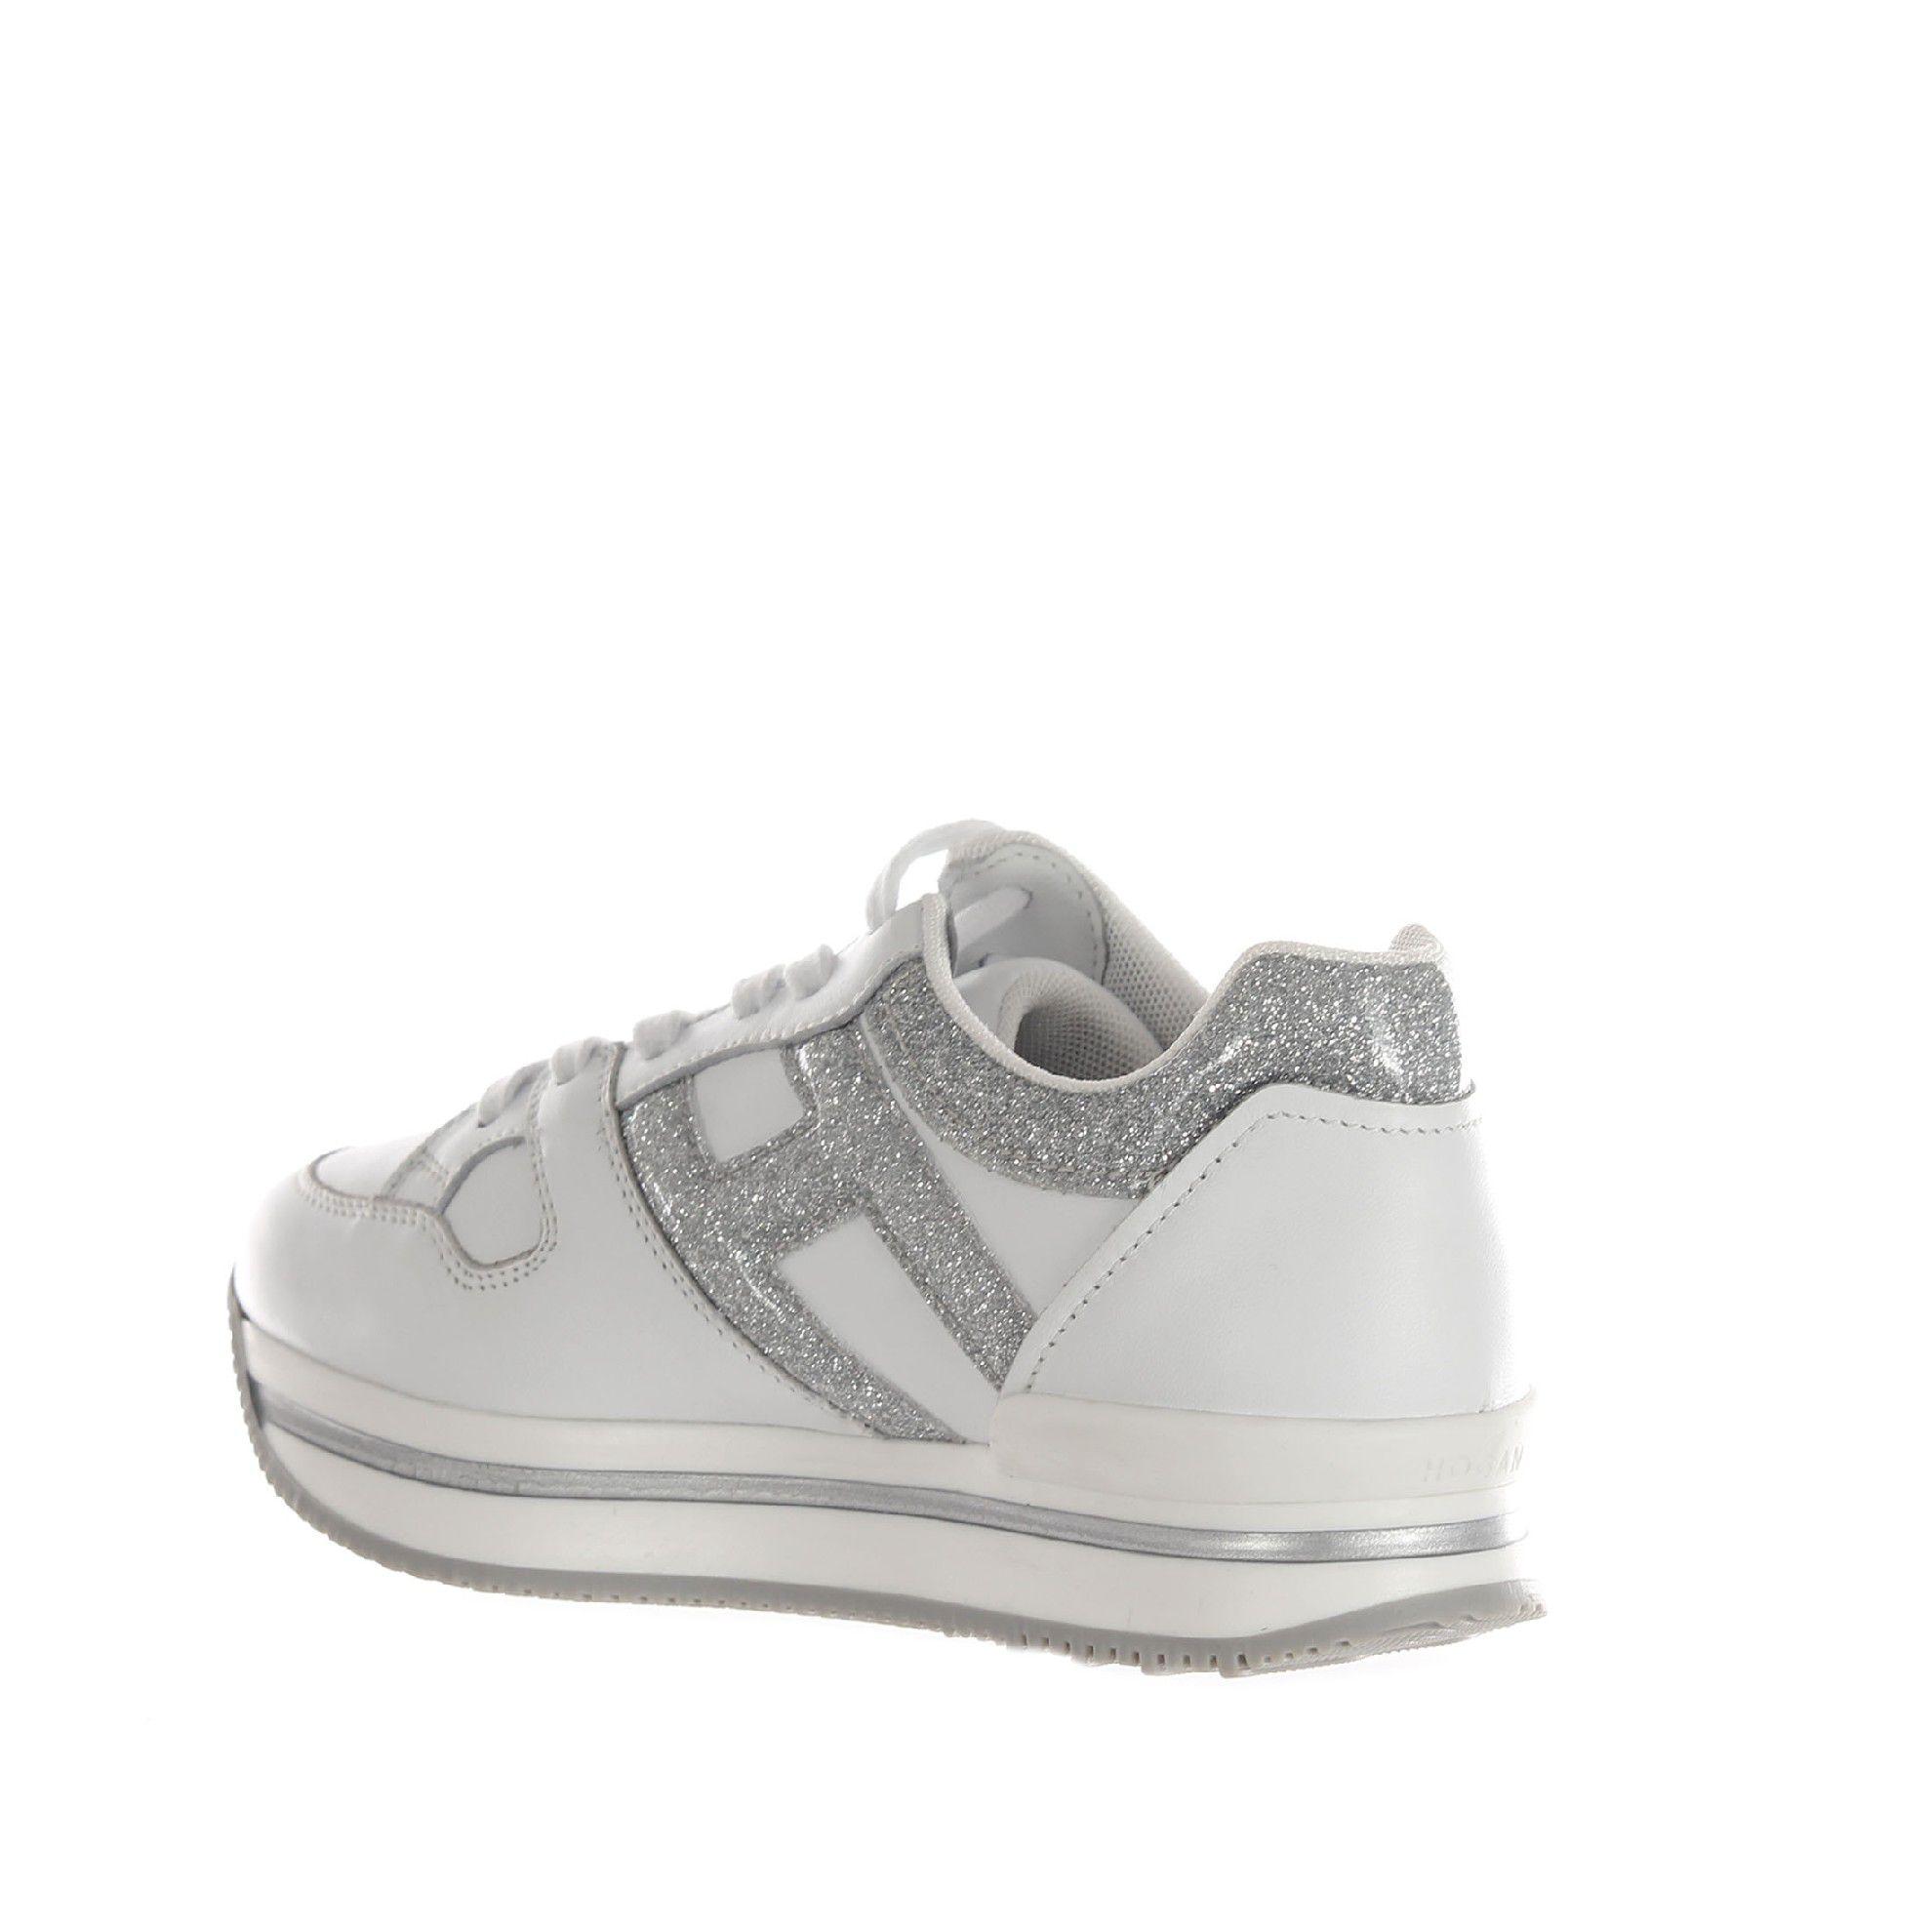 Hogan sneaker h222 in pelle e glitter da bambina